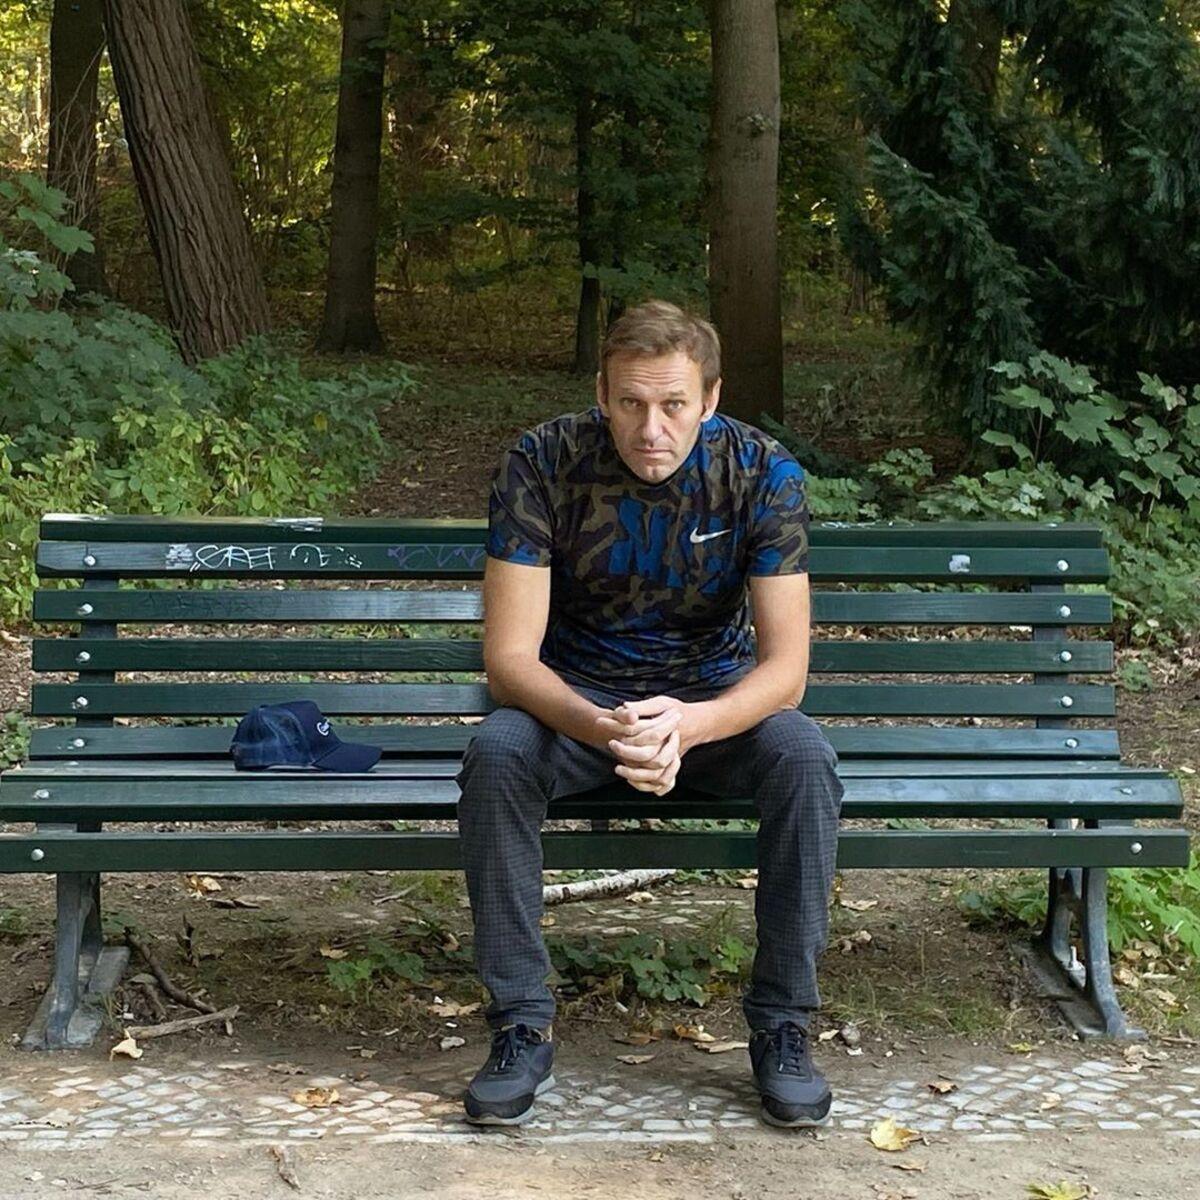 UE sancionó a seis colaboradores cercanos a Putin por envenenamiento de Navalny